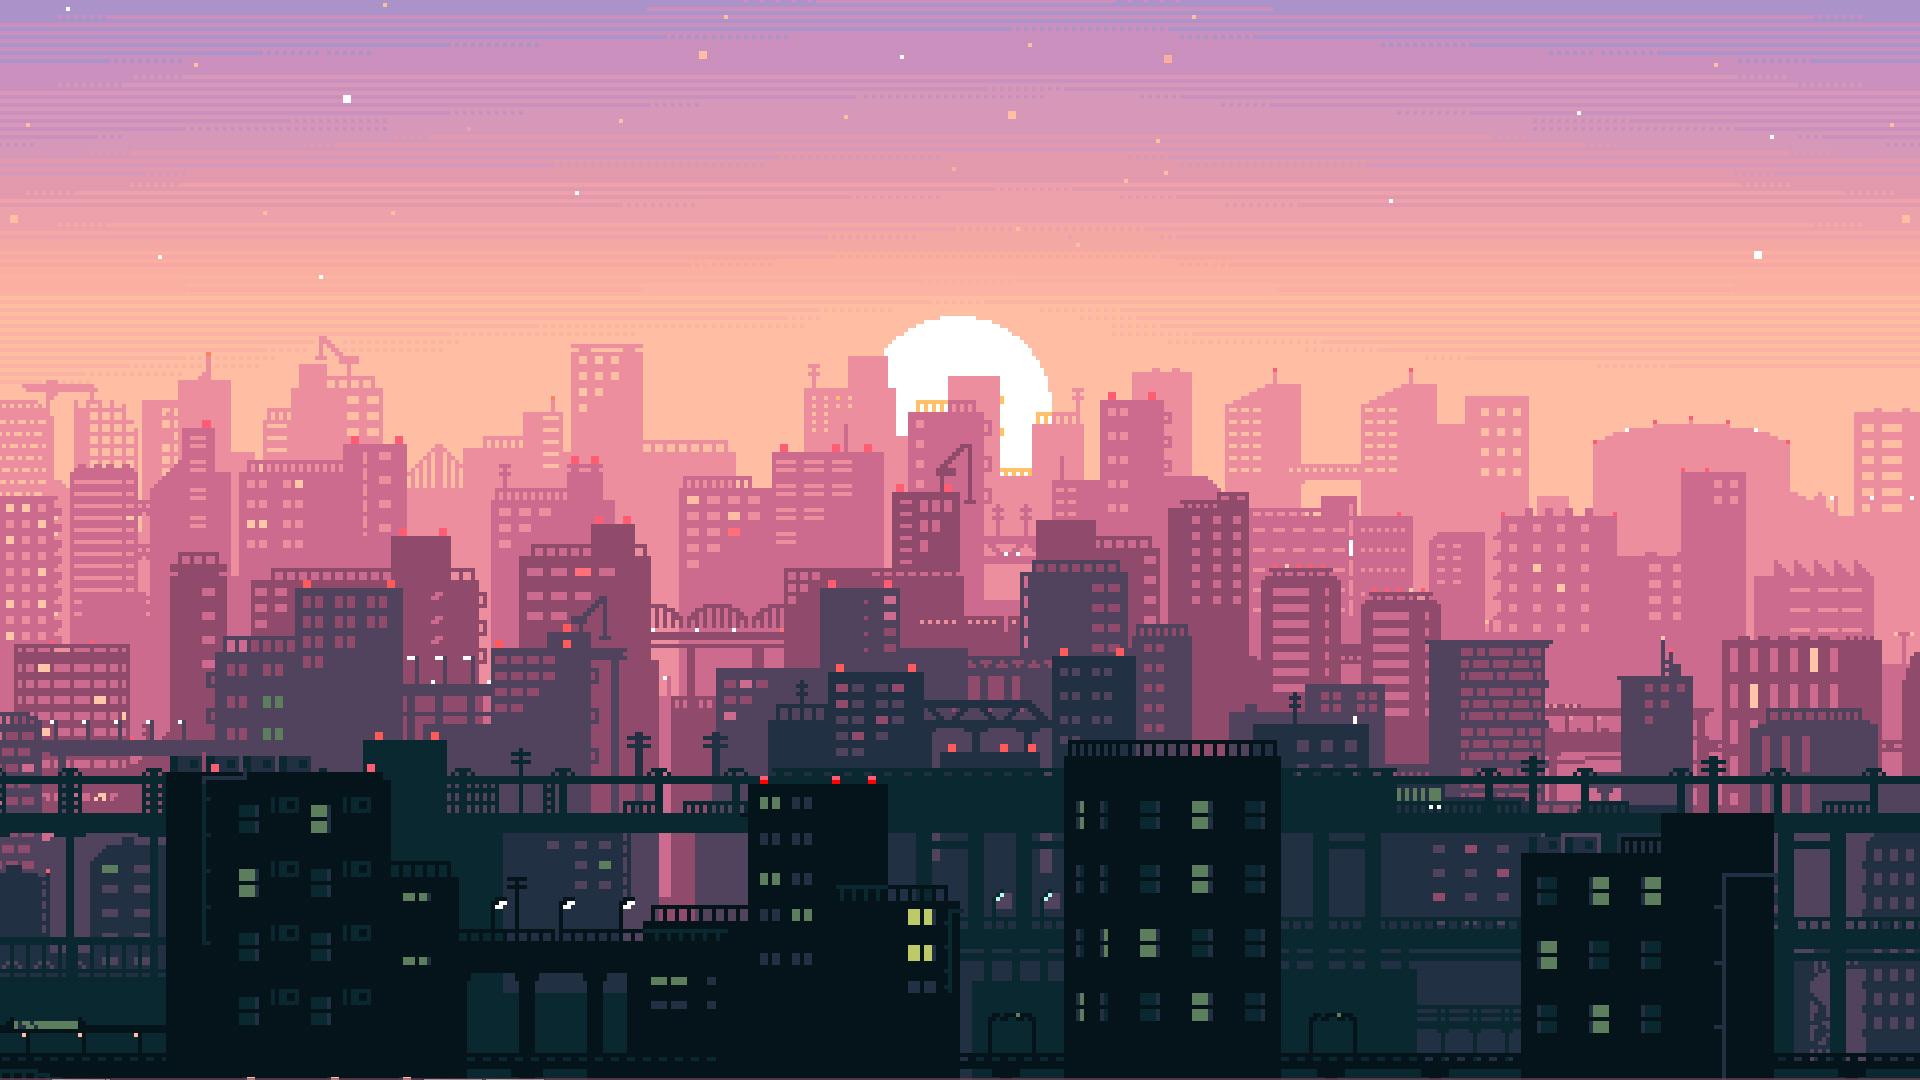 Wallpaper For Laptop City